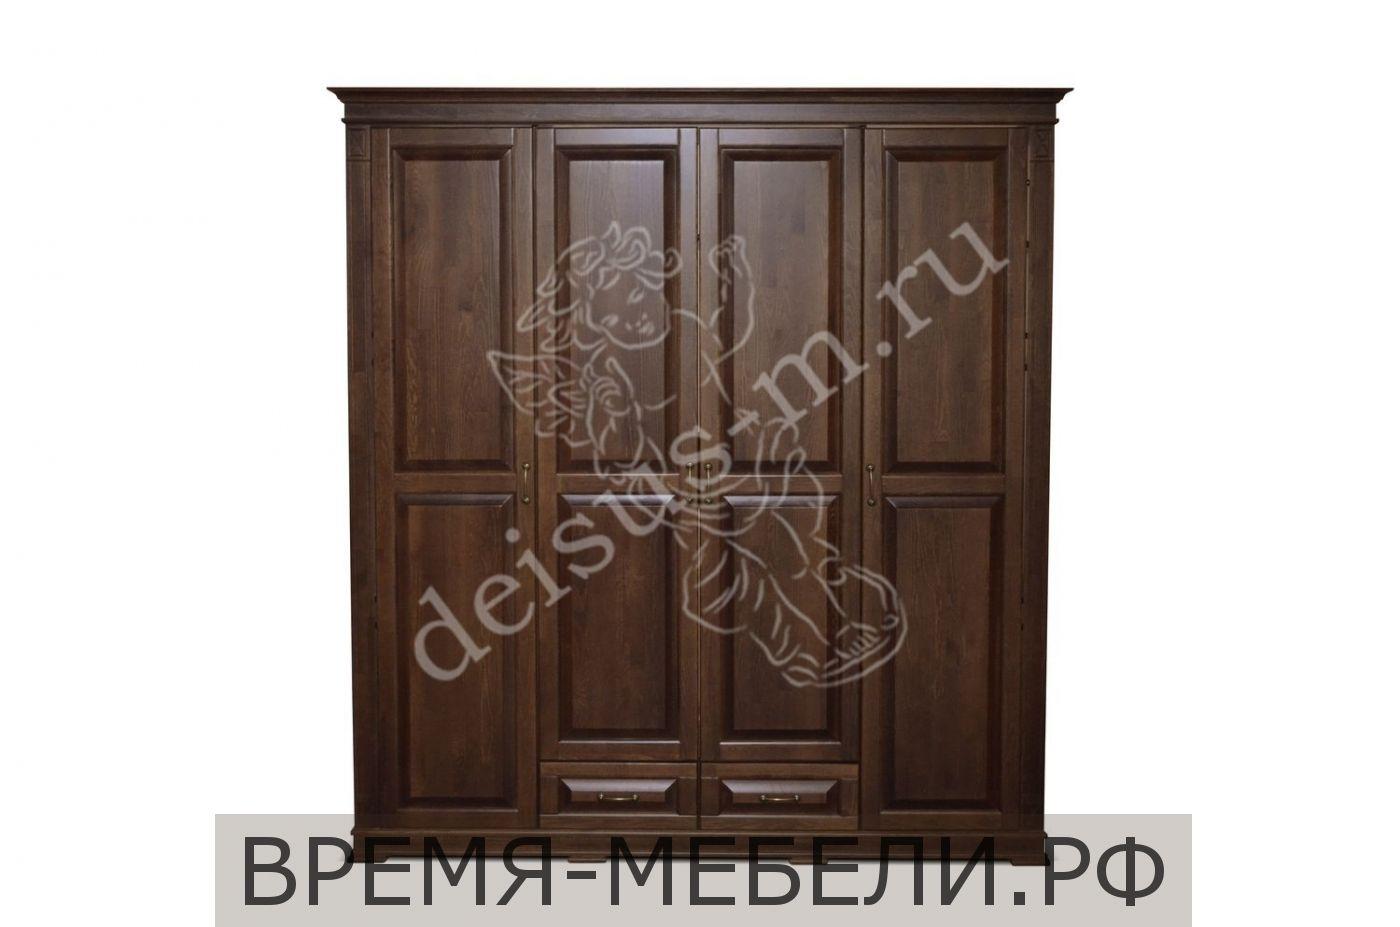 Шкаф четырехстворчатый Верди-М 2